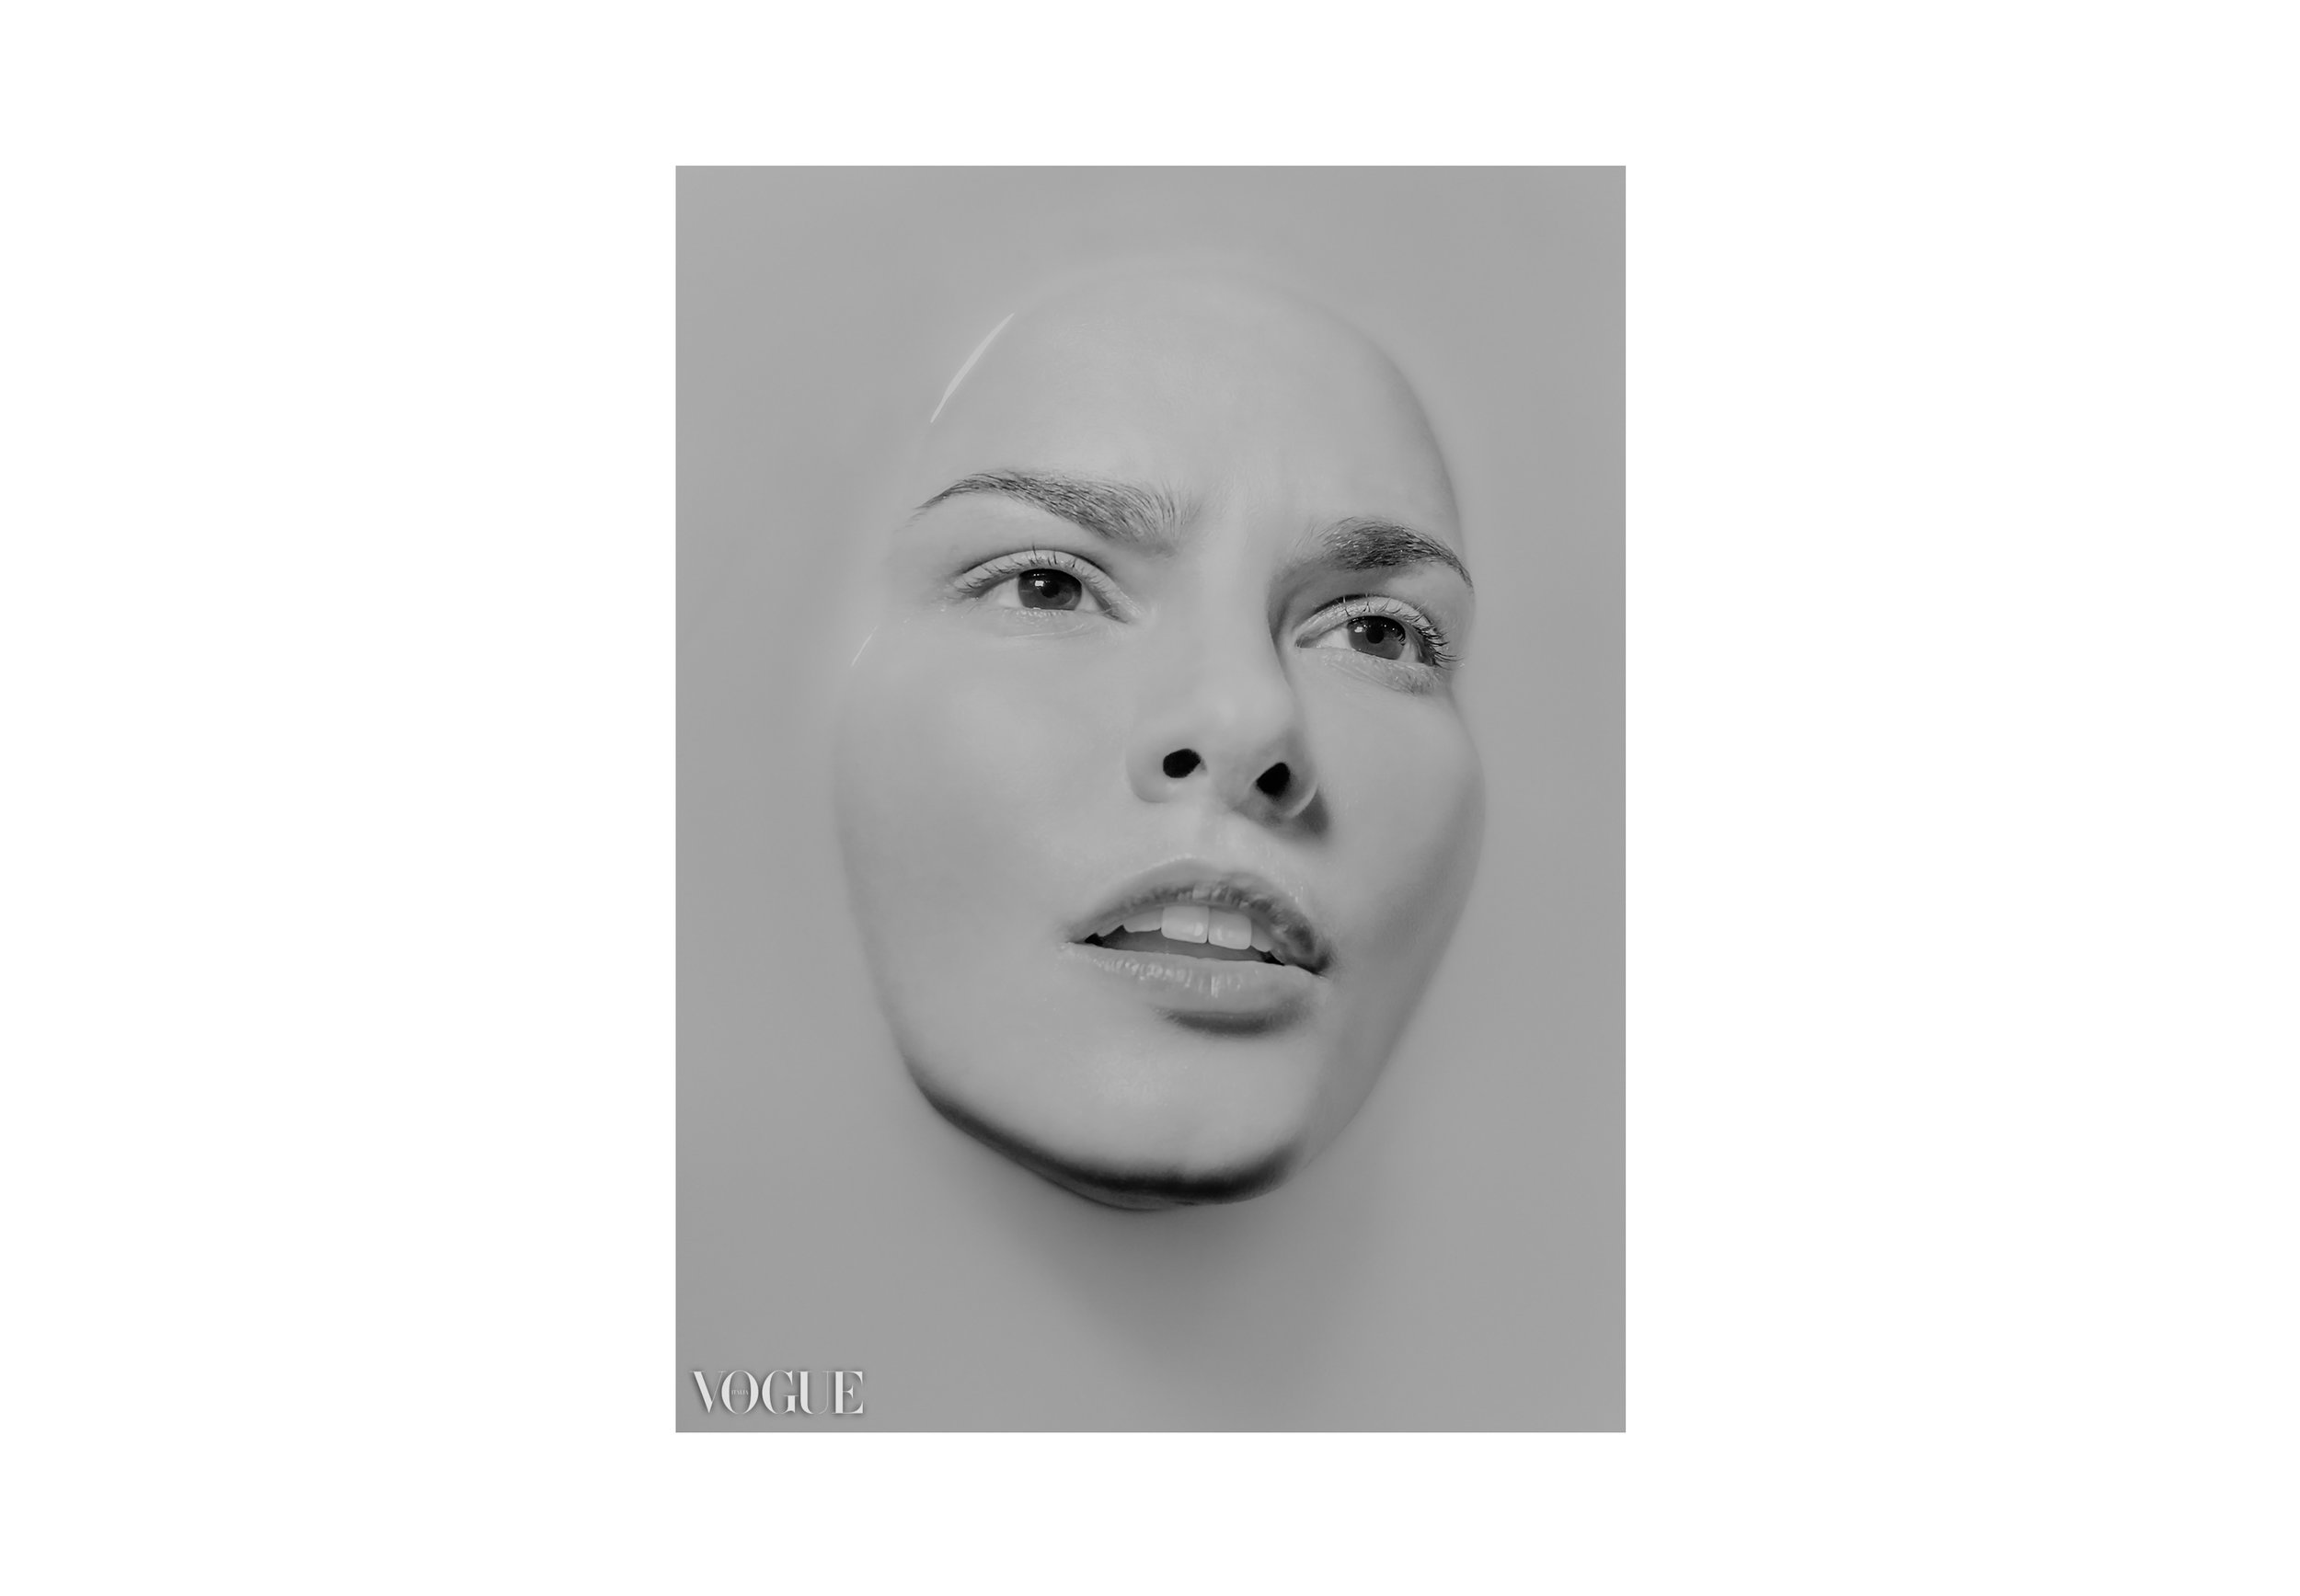 Dounia-Aleksic-Beauty-Berlin-PhotoVogue-Italia-Matthew-Coleman-Photography.jpg